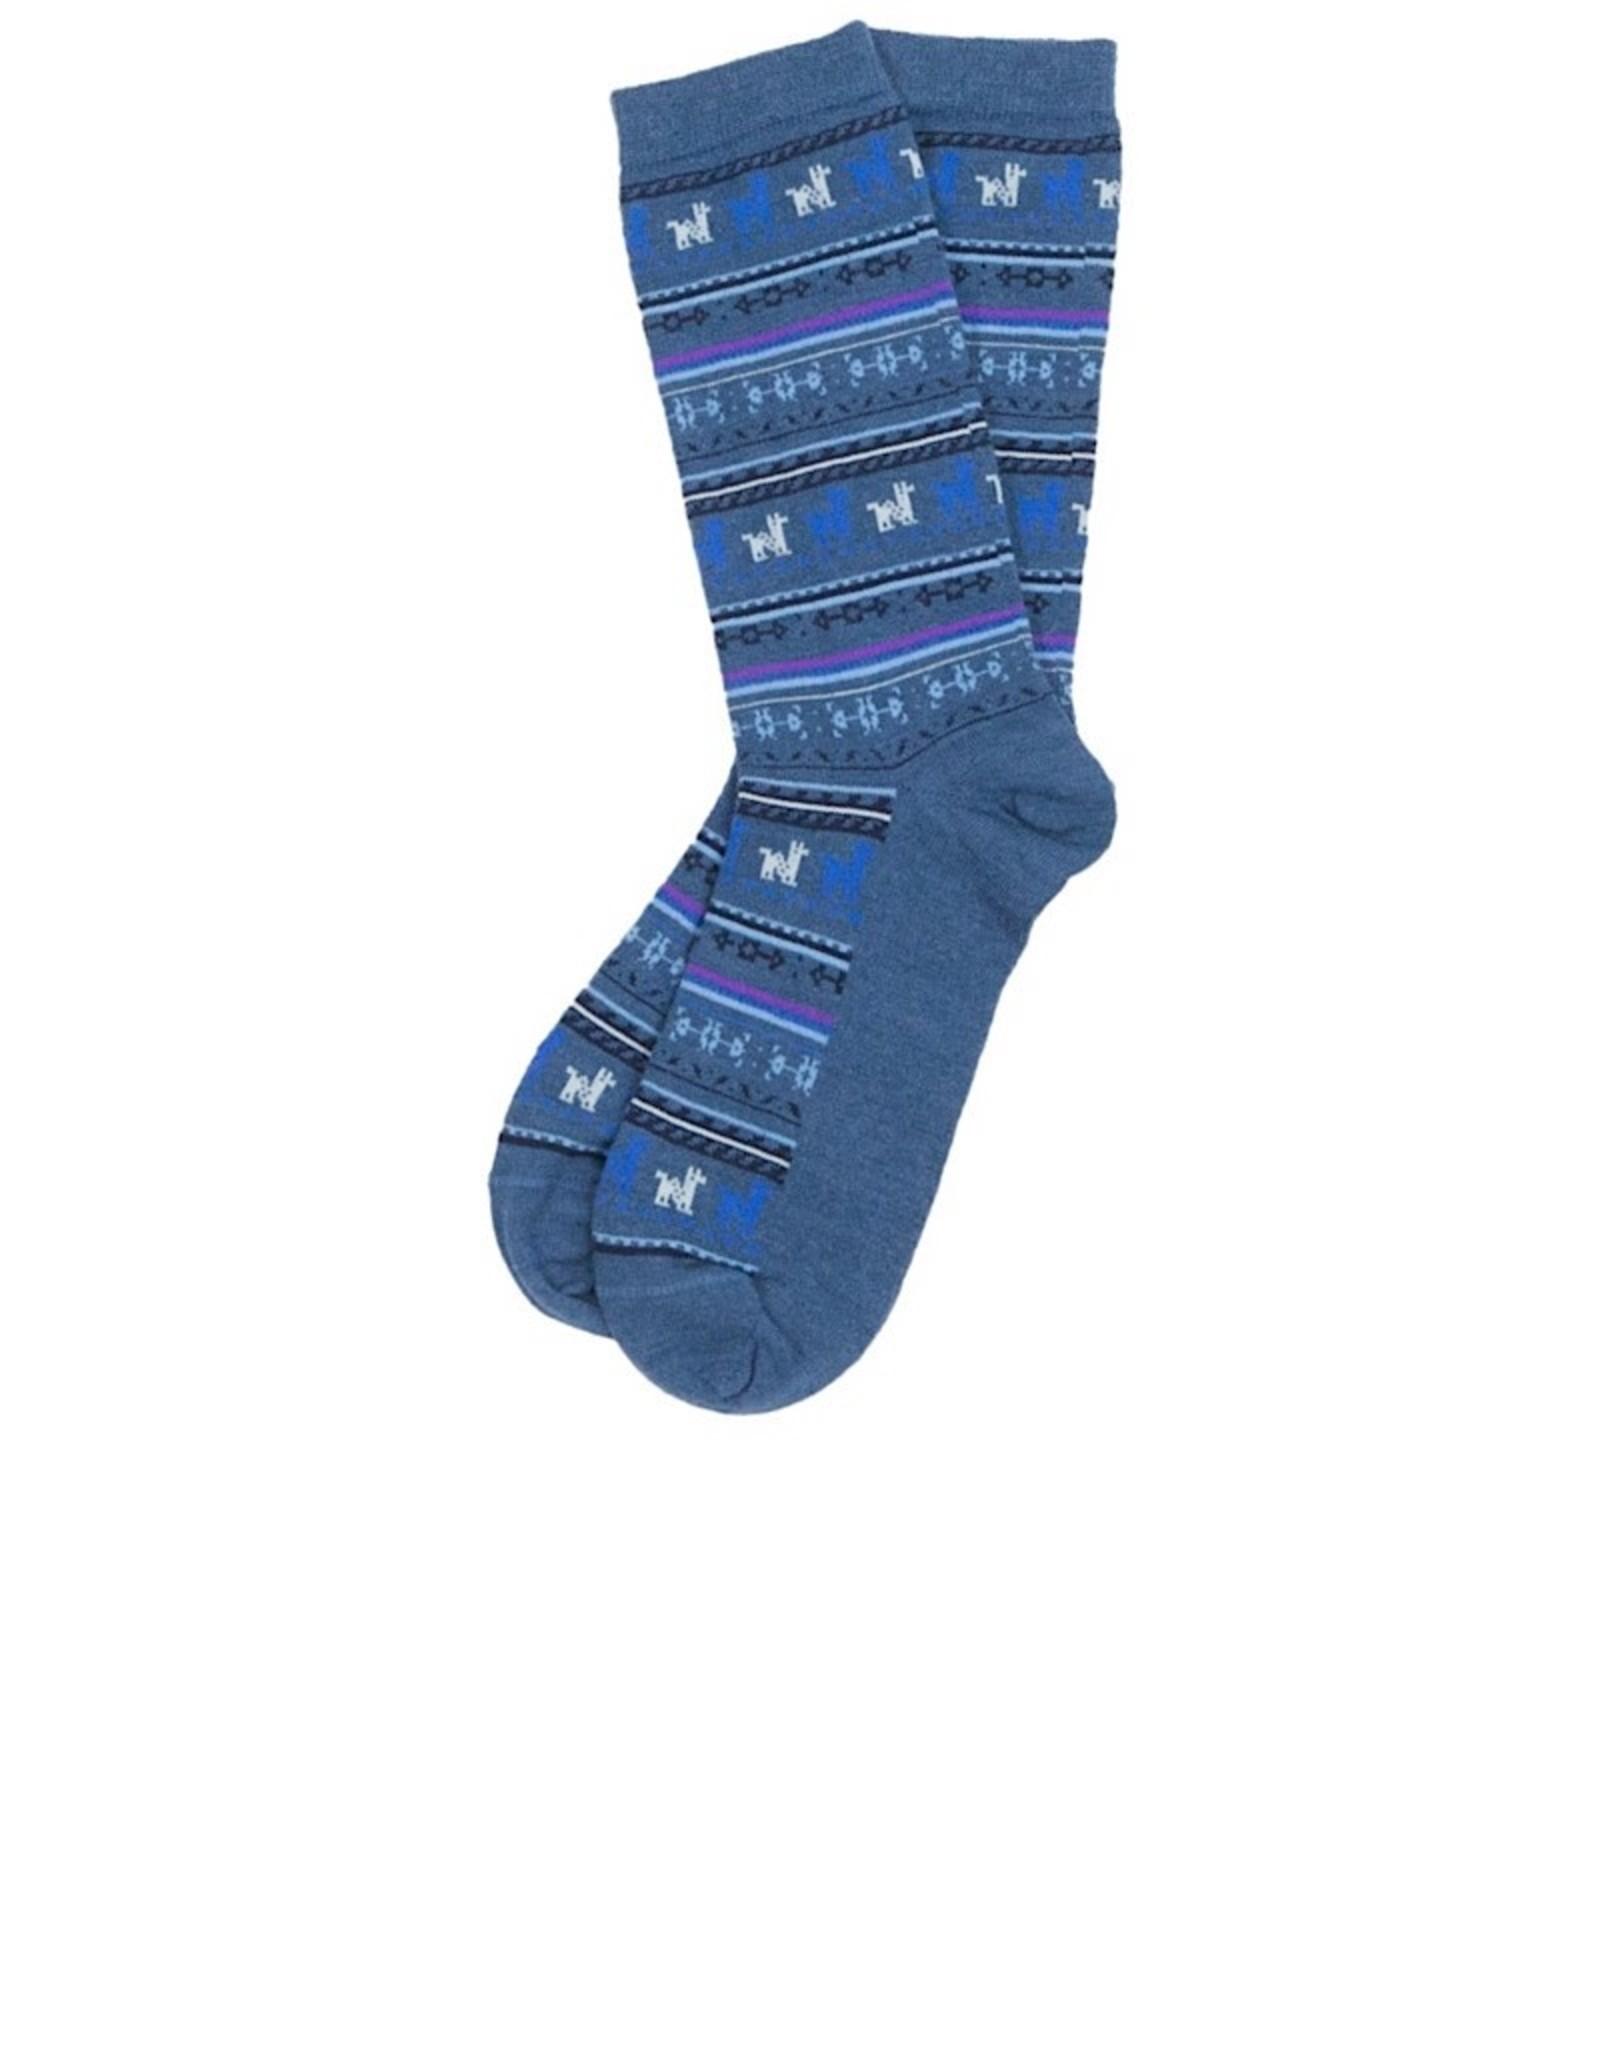 Alpaca Print Socks Demin Small Medium